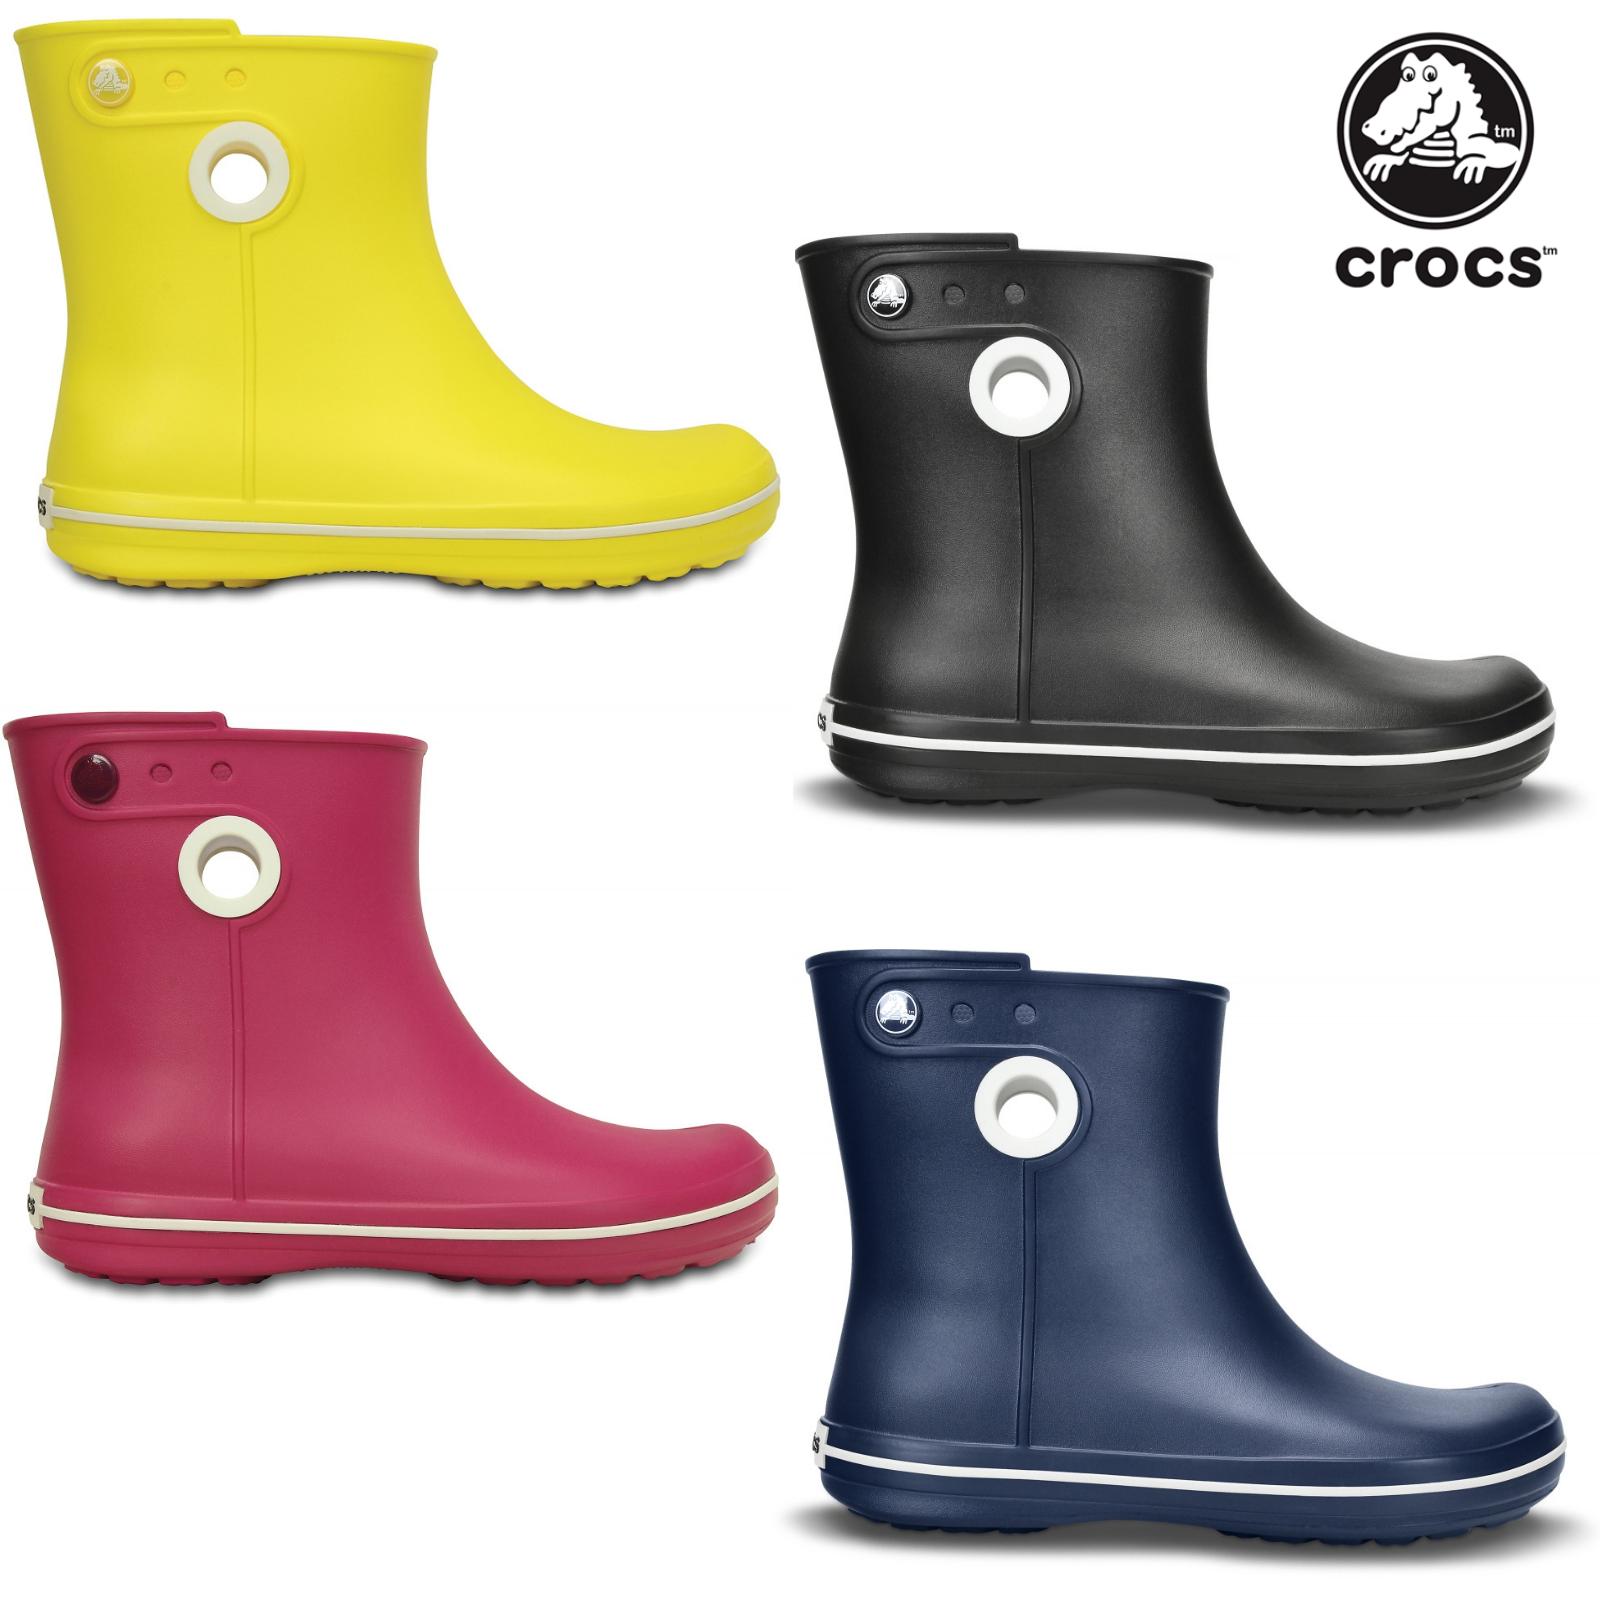 Crocs Women Jaunt Shorty Boot Damen Schuhe Gummistiefel